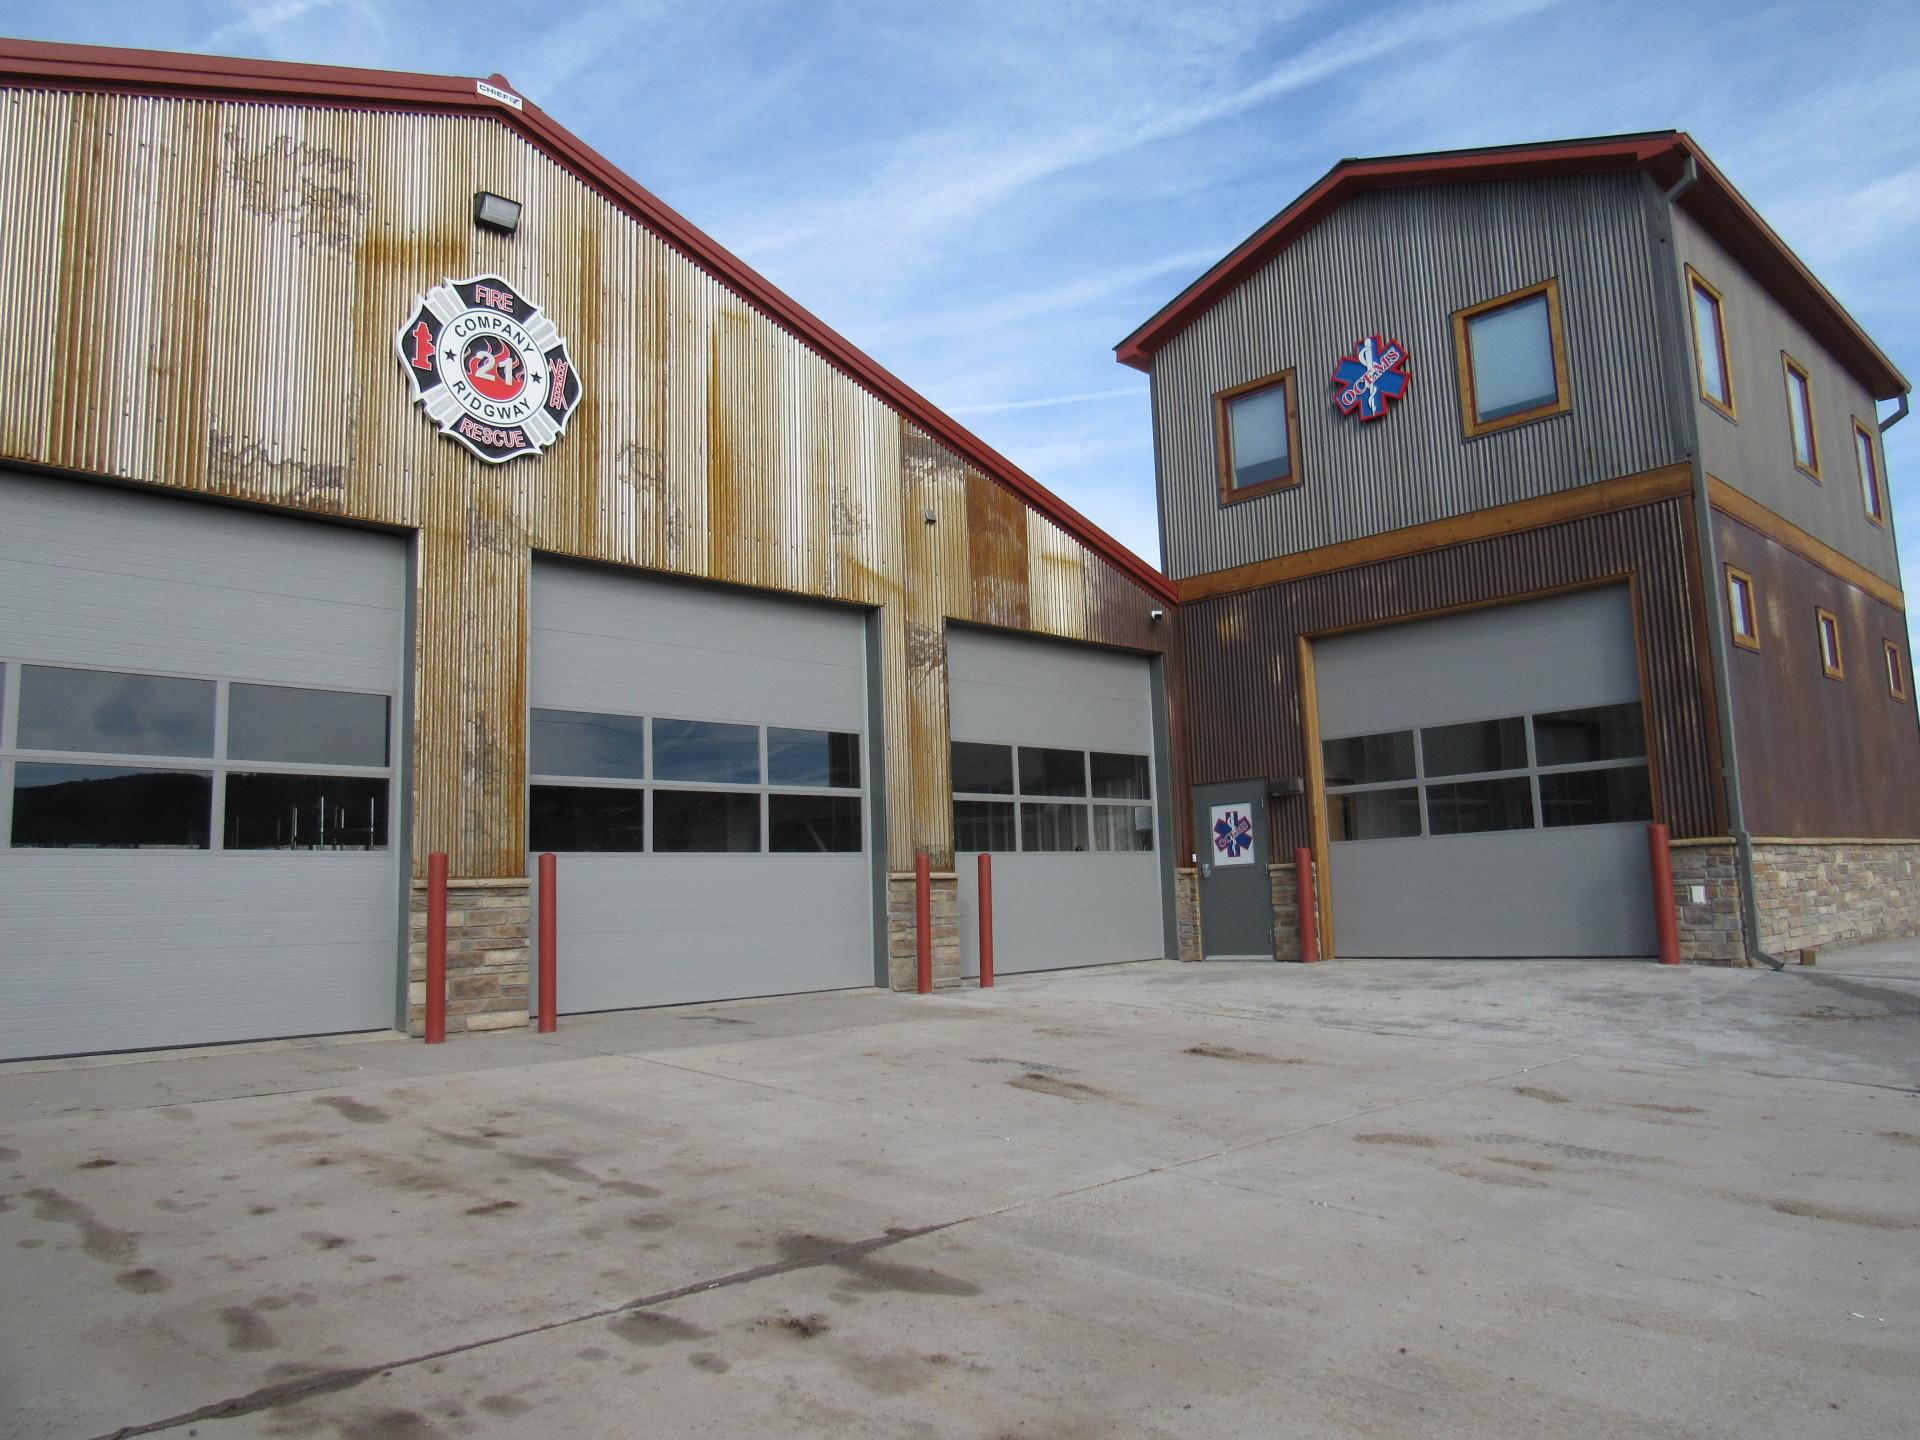 Ridgway Fire Station